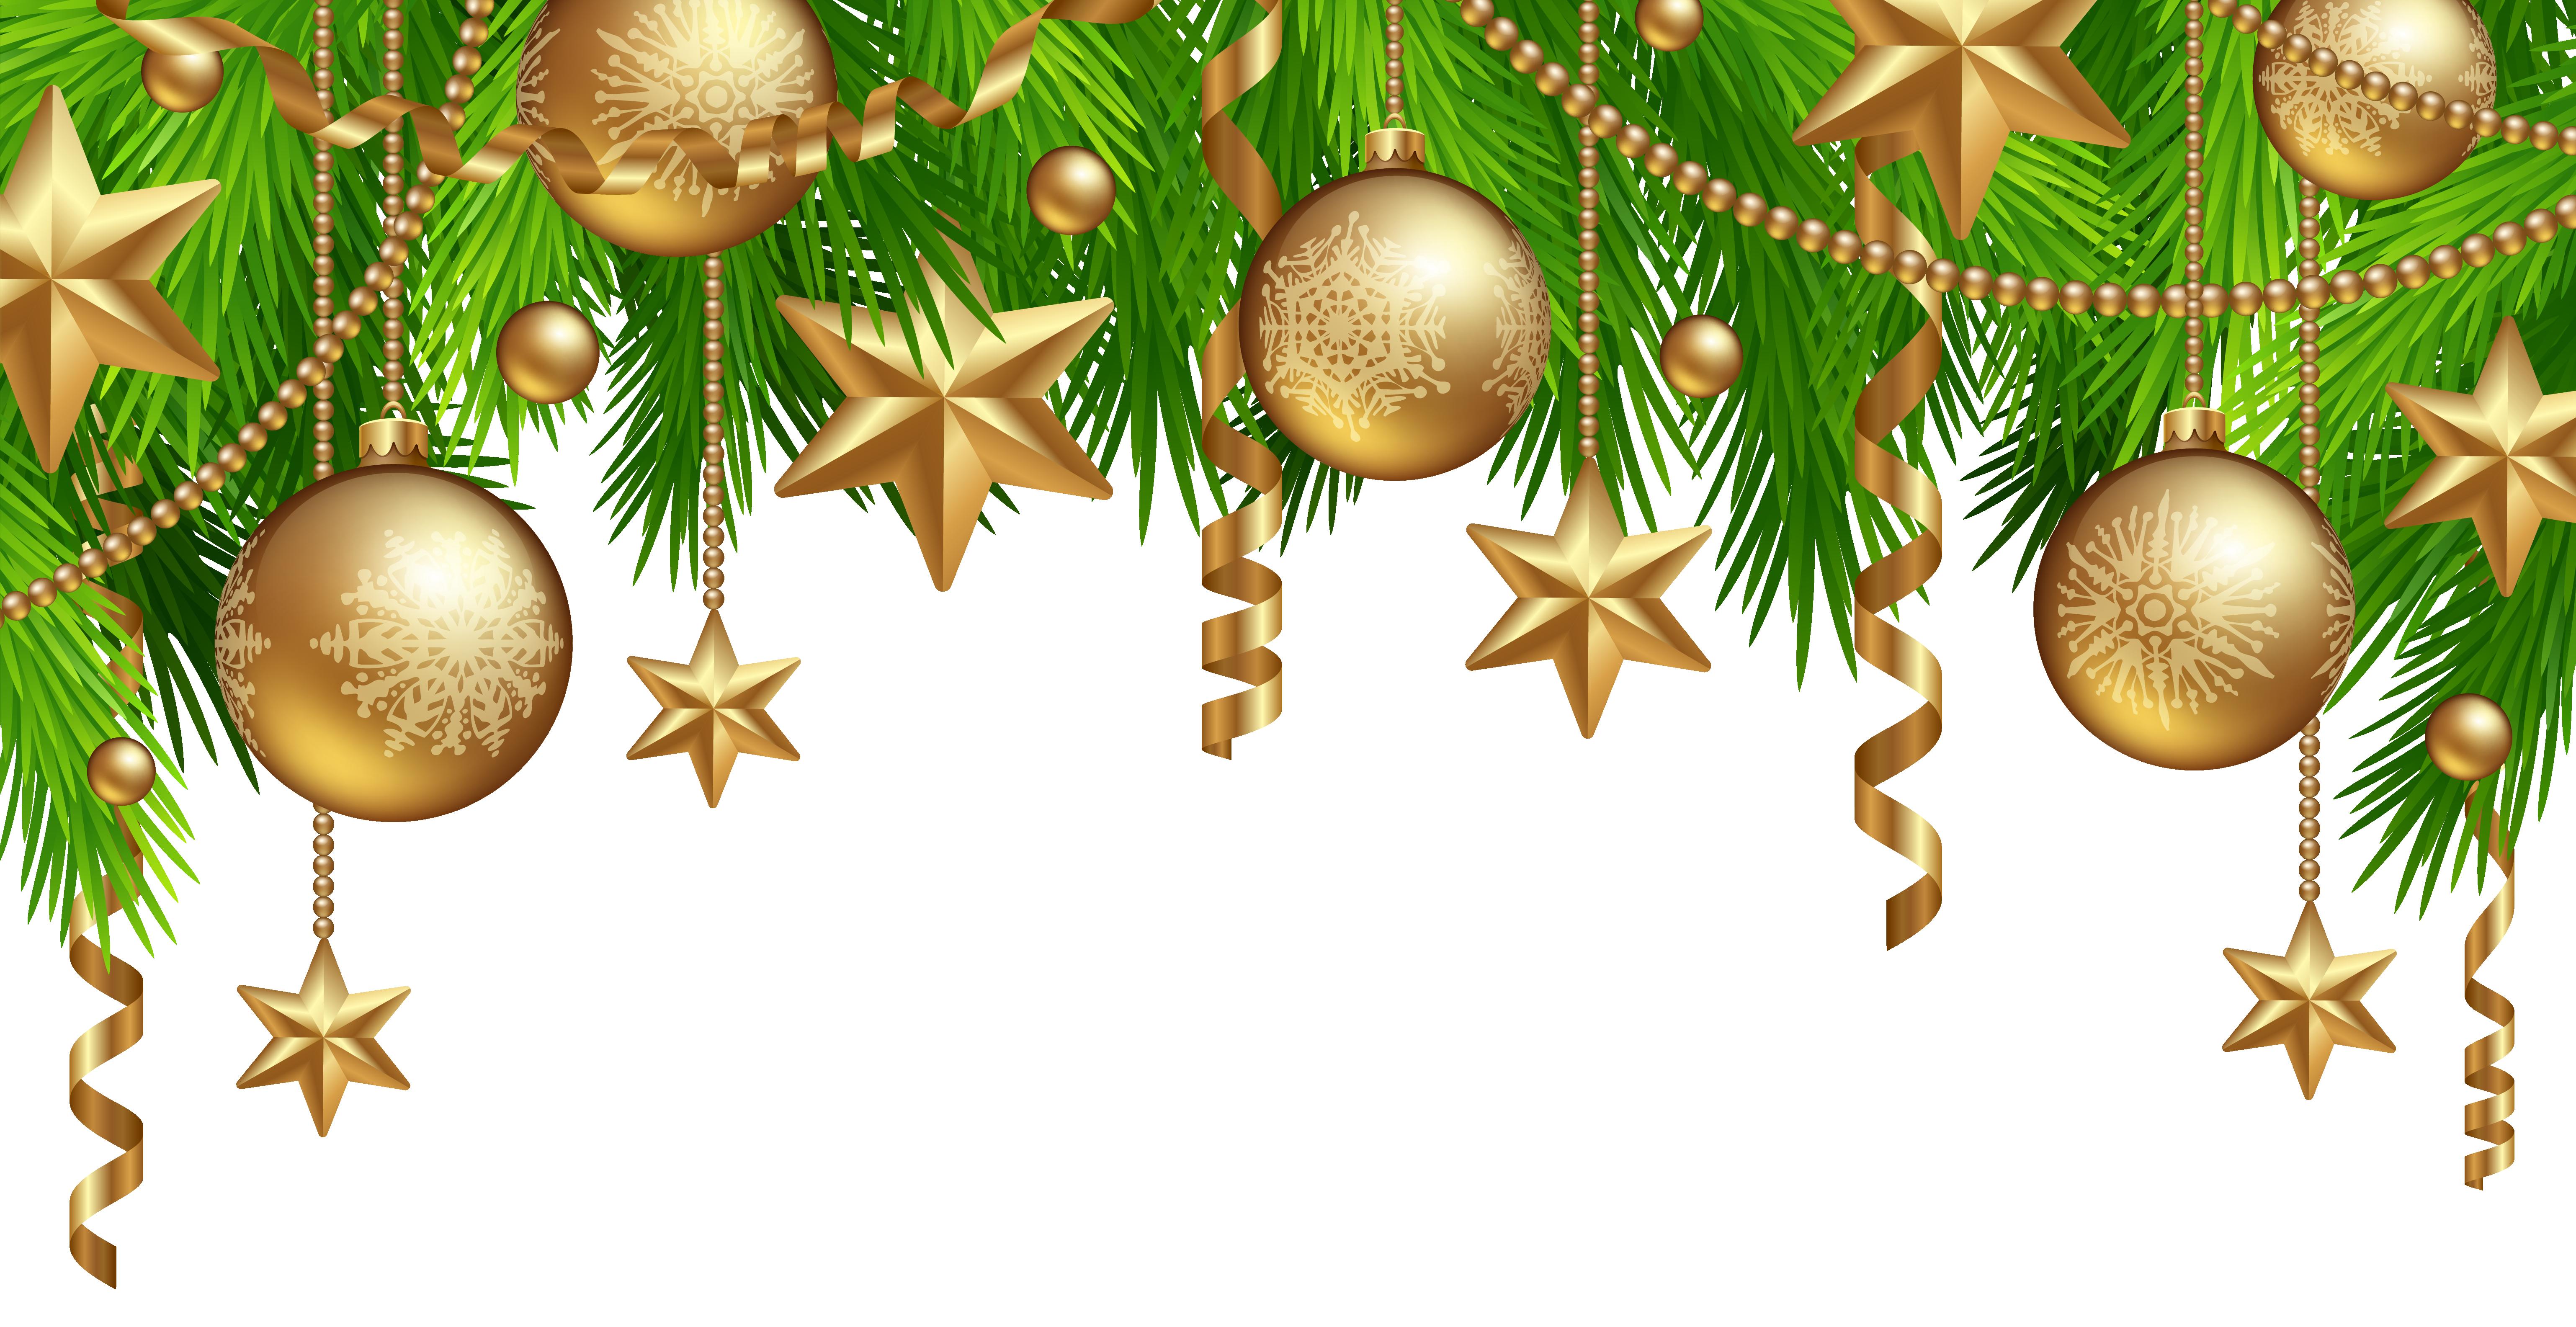 Clipart christmas border vector Christmas Border Decor PNG Clipart Image | Gallery Yopriceville ... vector